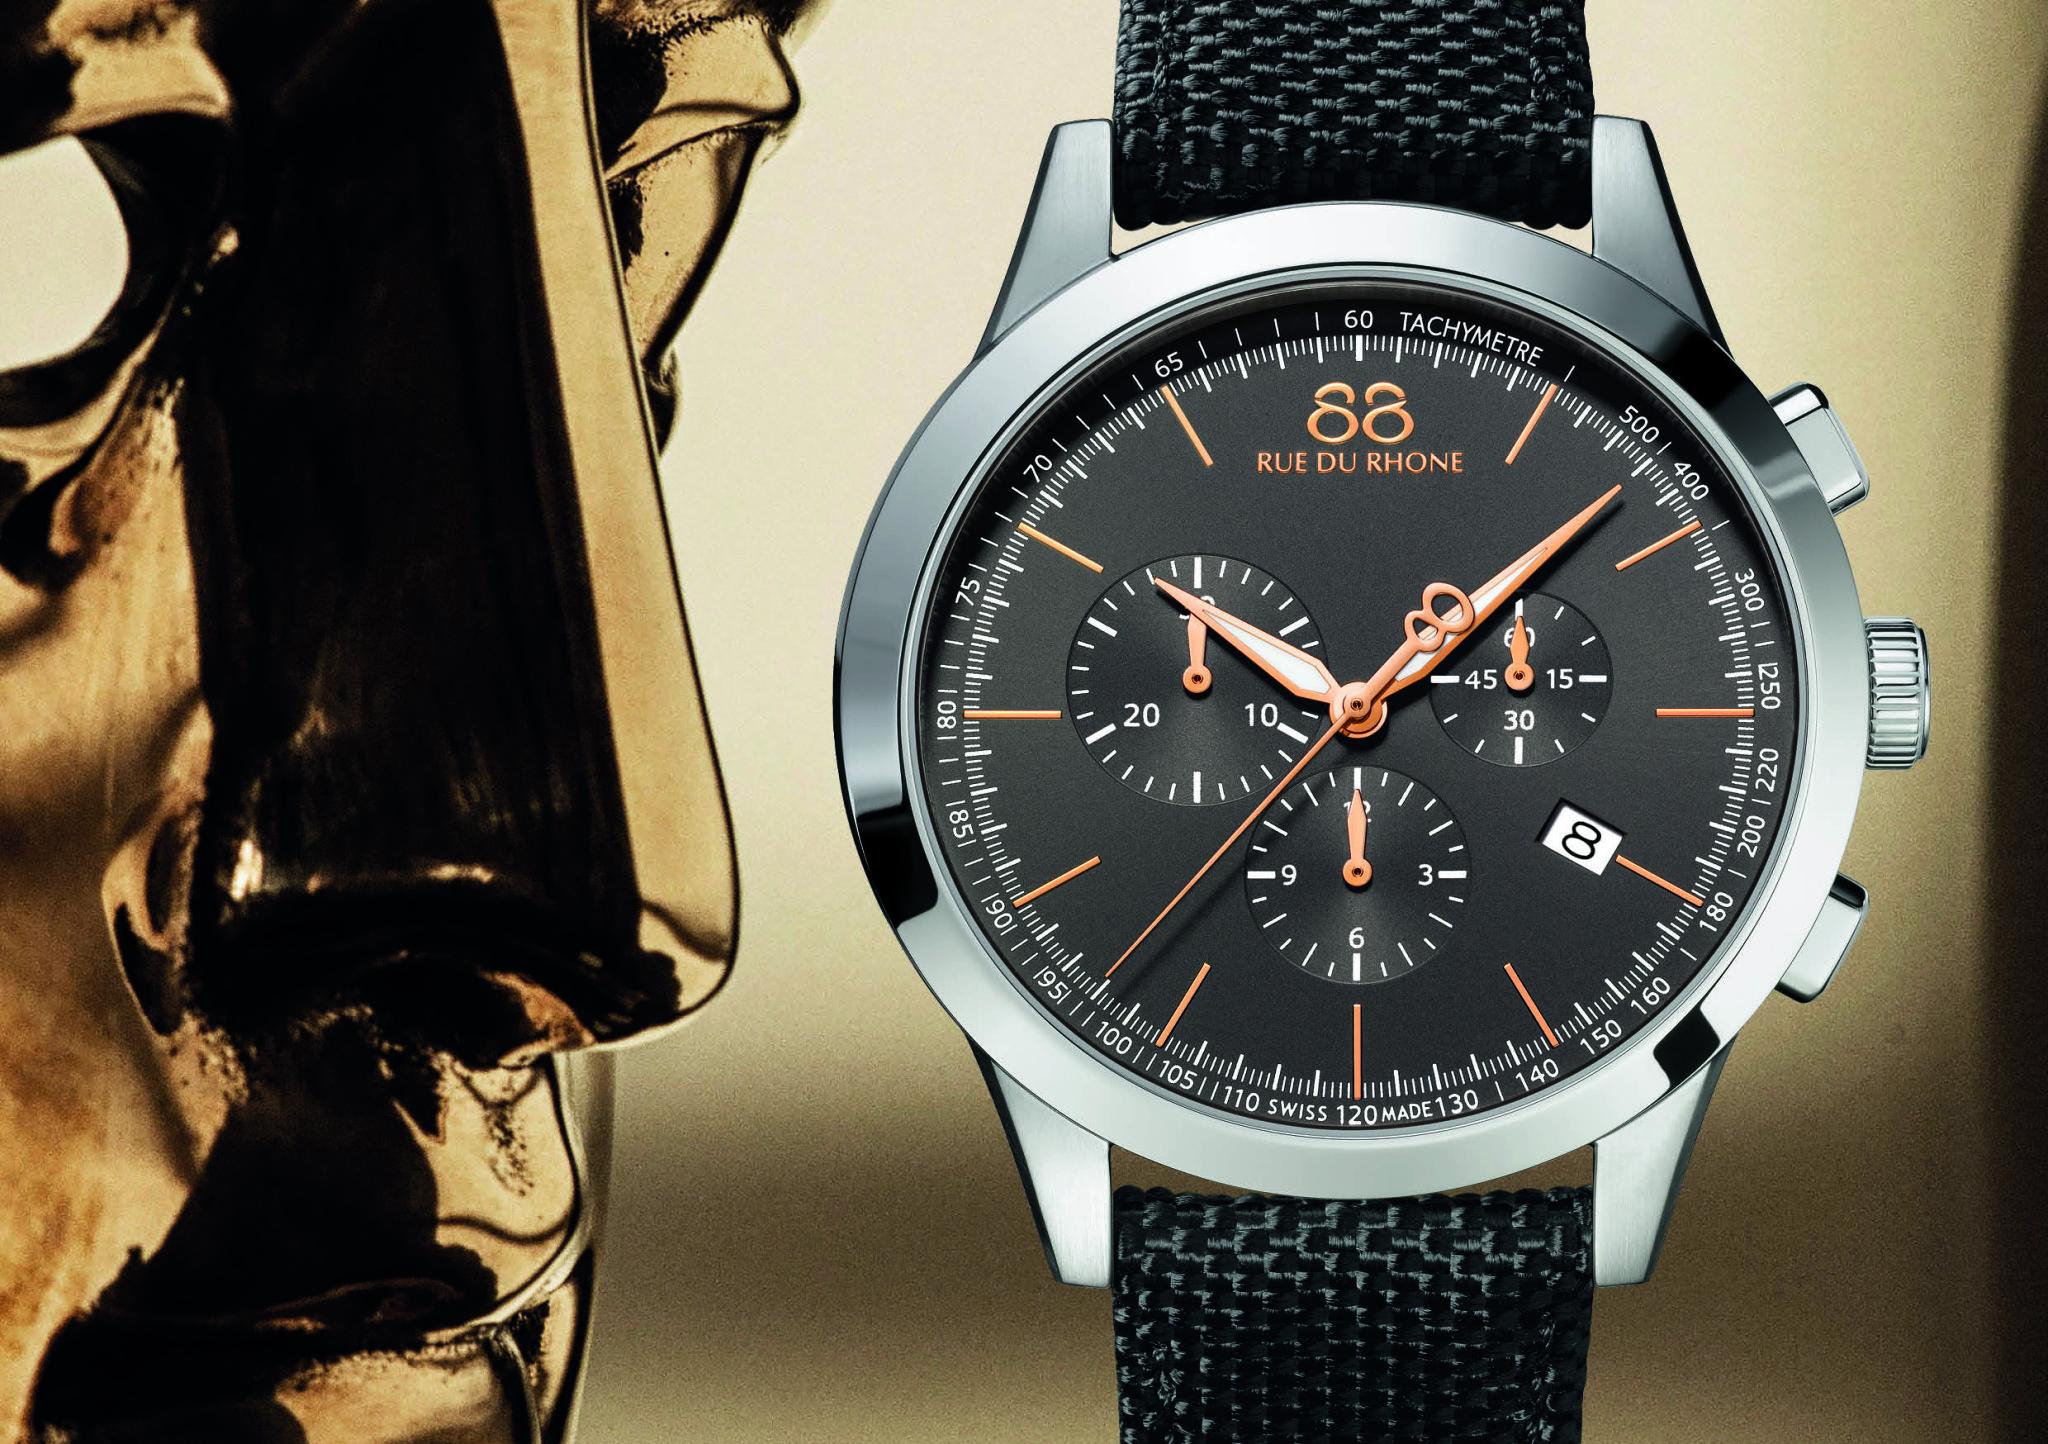 Watch 88 Rue Du Rhone Release Official BAFTA Timepiece video